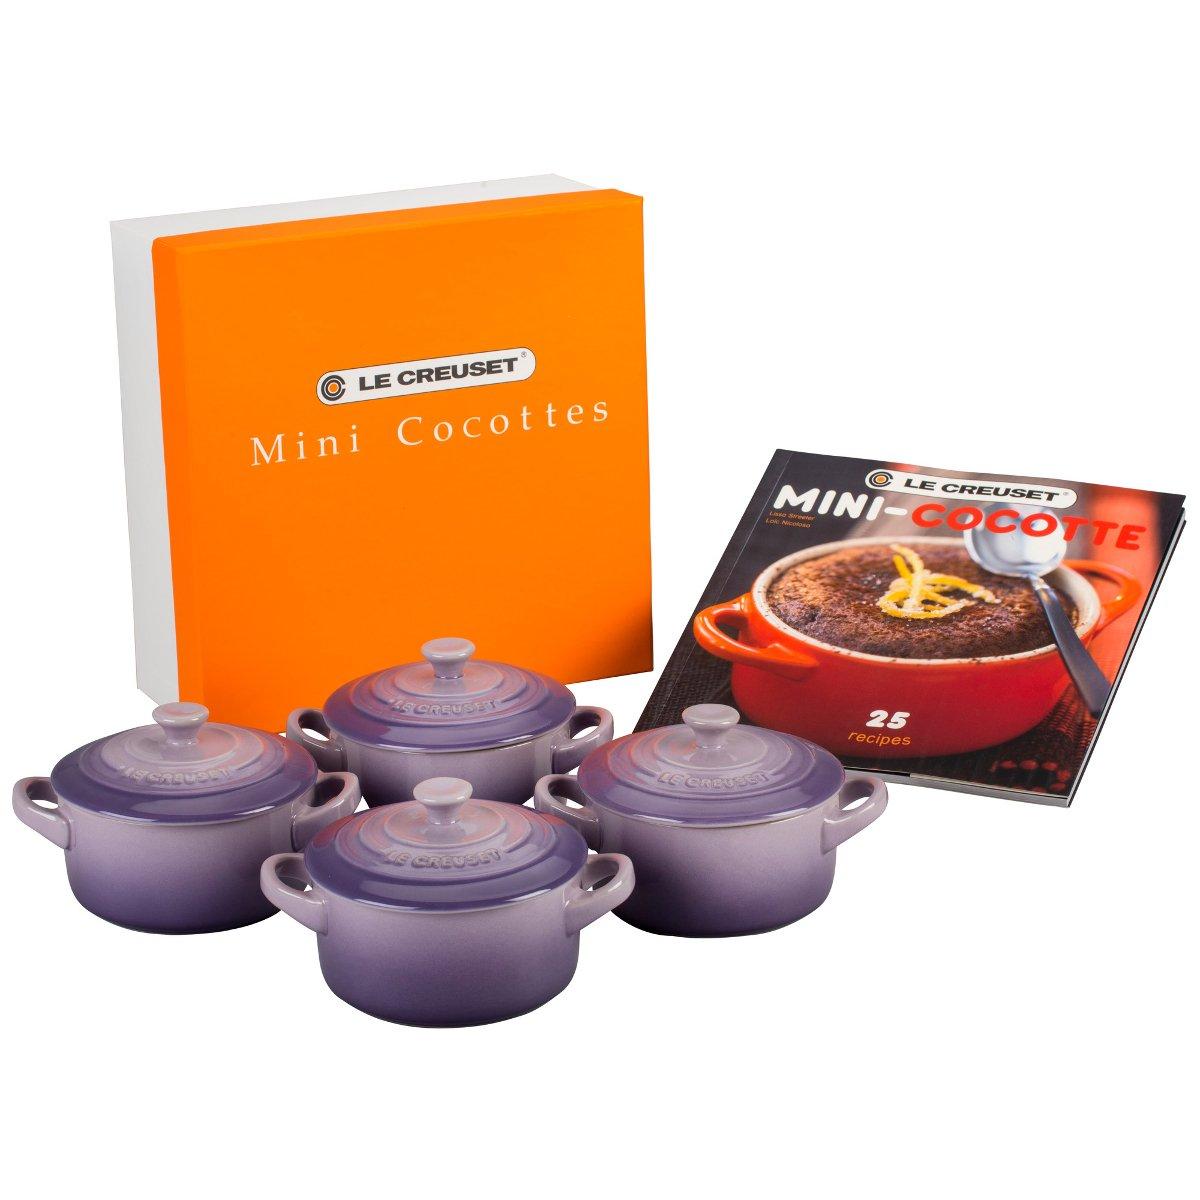 Le Creuset PG1164CB-08BP Stoneware Mini Cocottes And Cookbook (Set of 4) 8 oz Provence